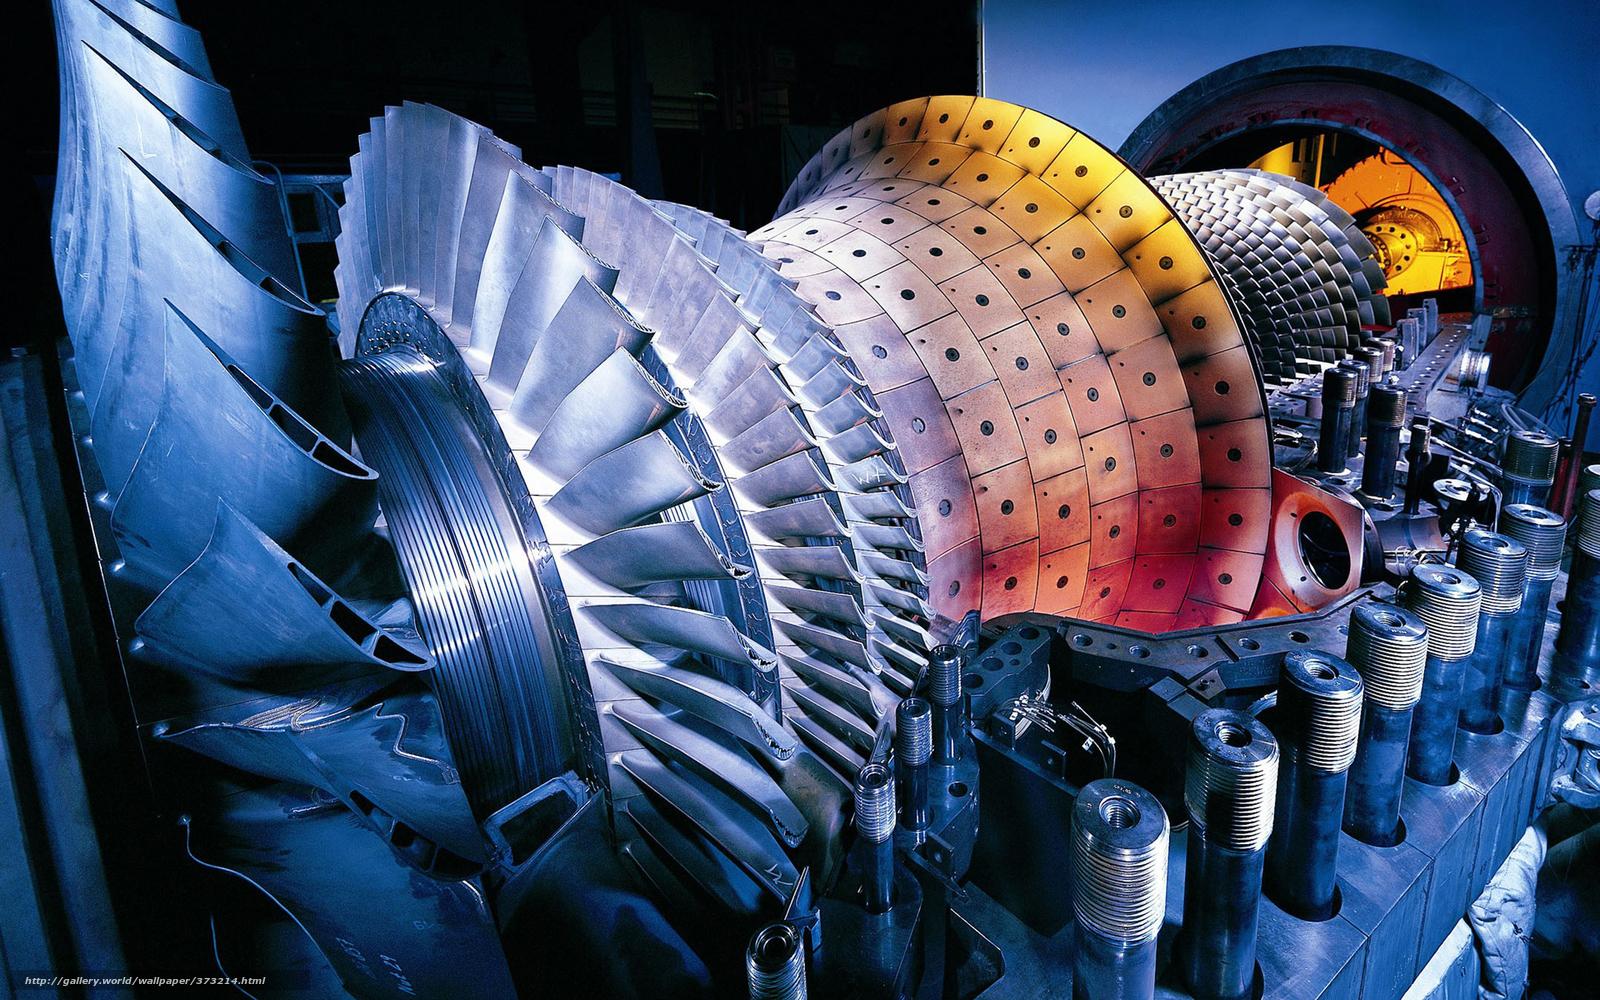 373214_turbina_krylchatka_detali_dvigatel_1920x1200_www.Gde-Fon.com